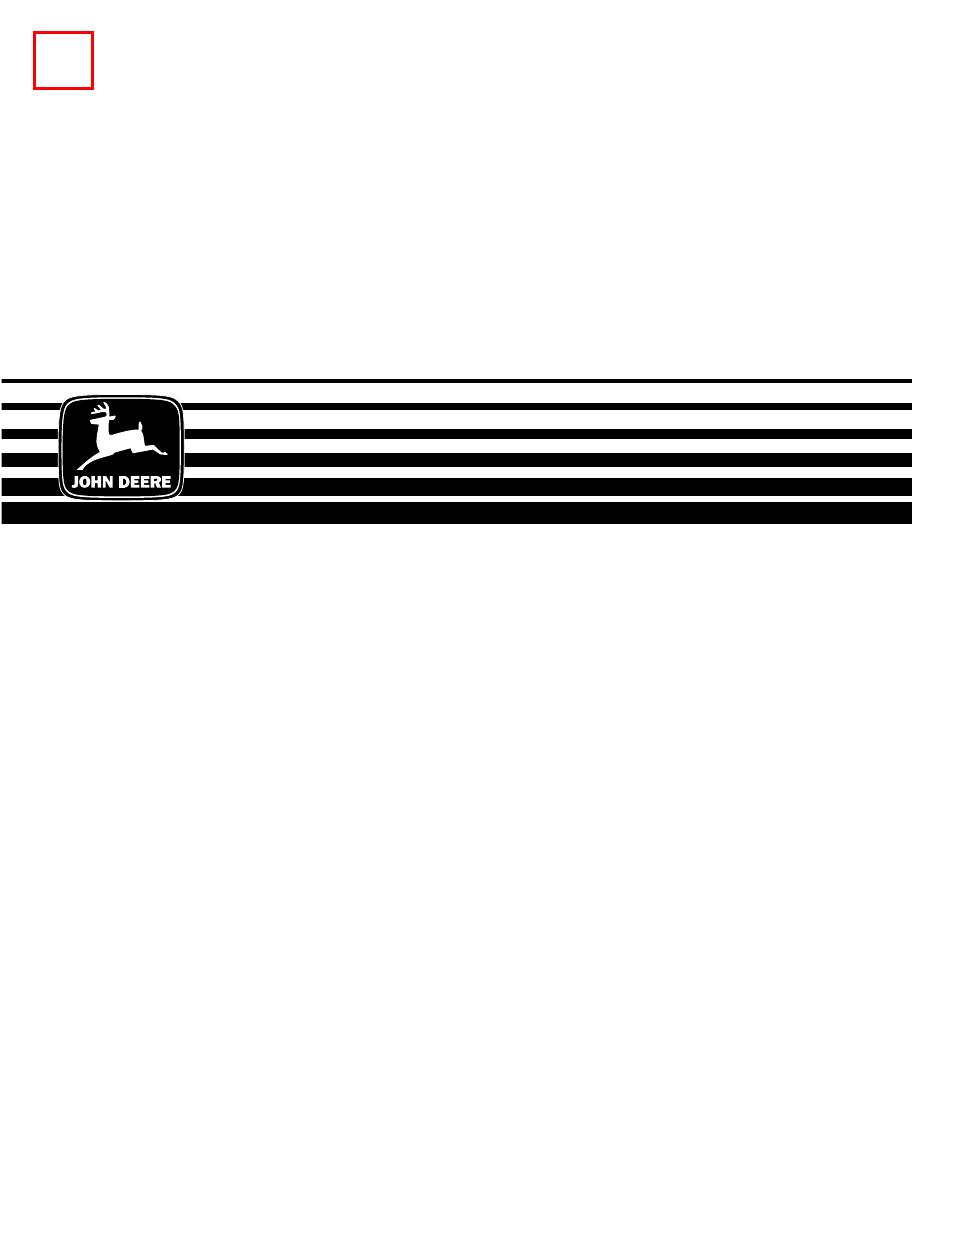 John Deere 4320 Error Codes Diagram – John Deere Tractor Model 3120 Wiring Diagram 2007